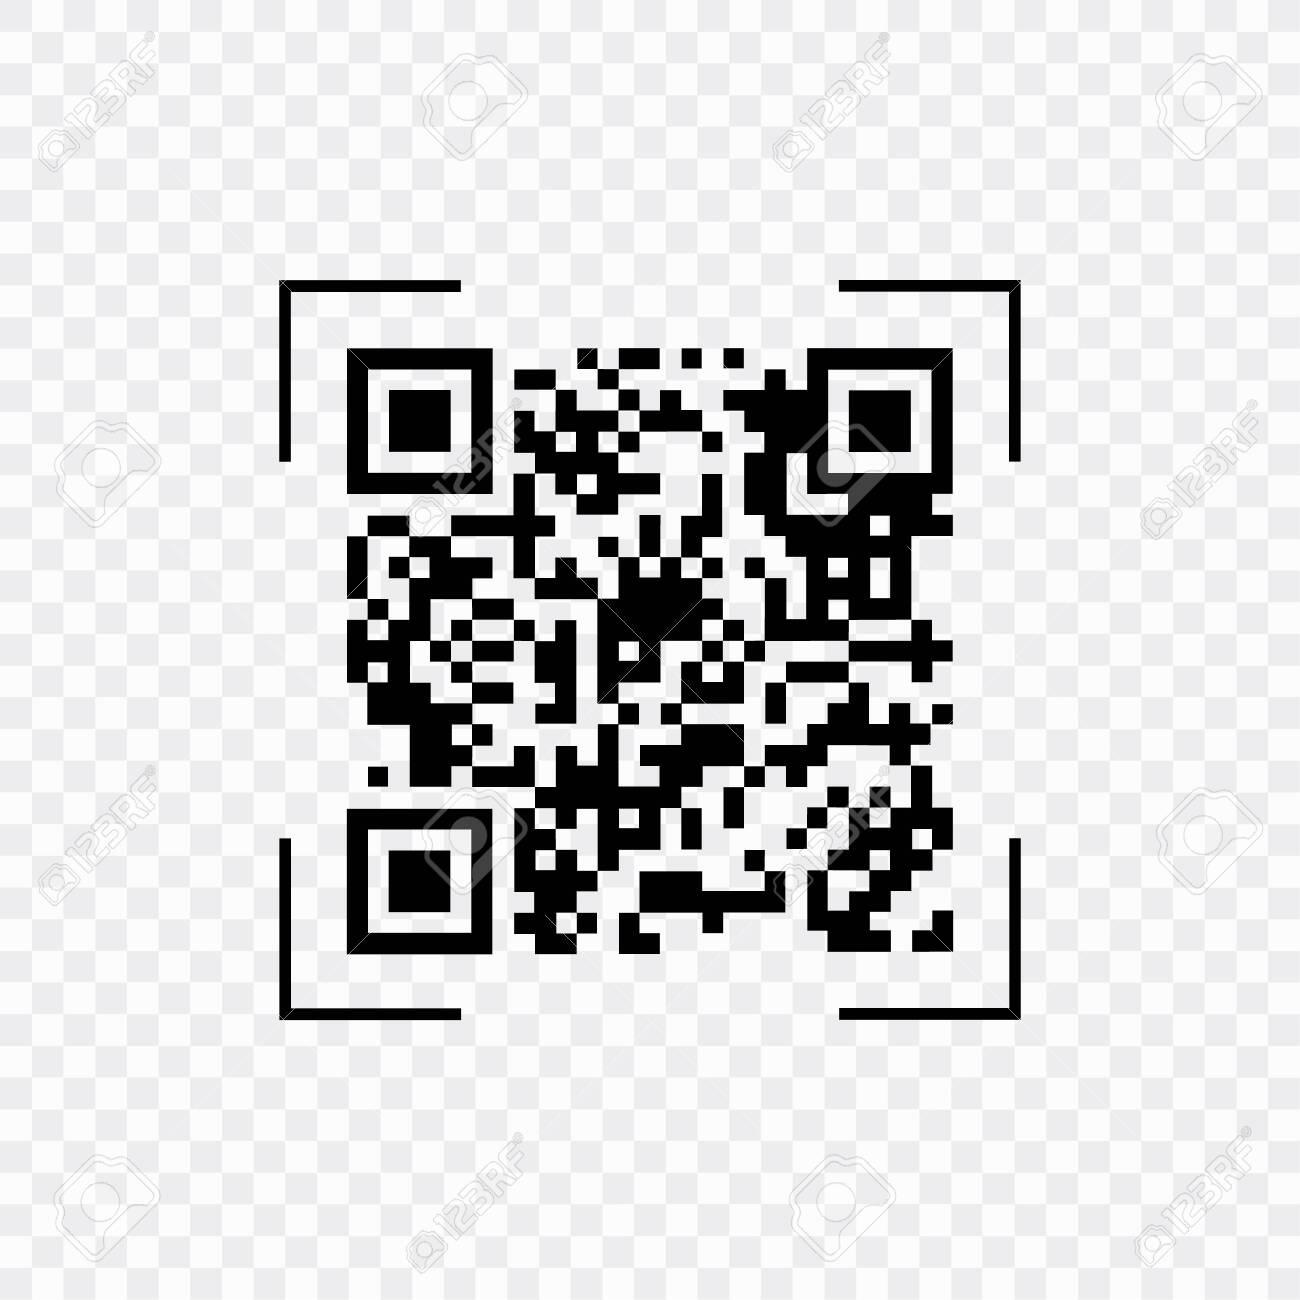 Scan QR code, symbol, app  Electronic , digital technology barcode